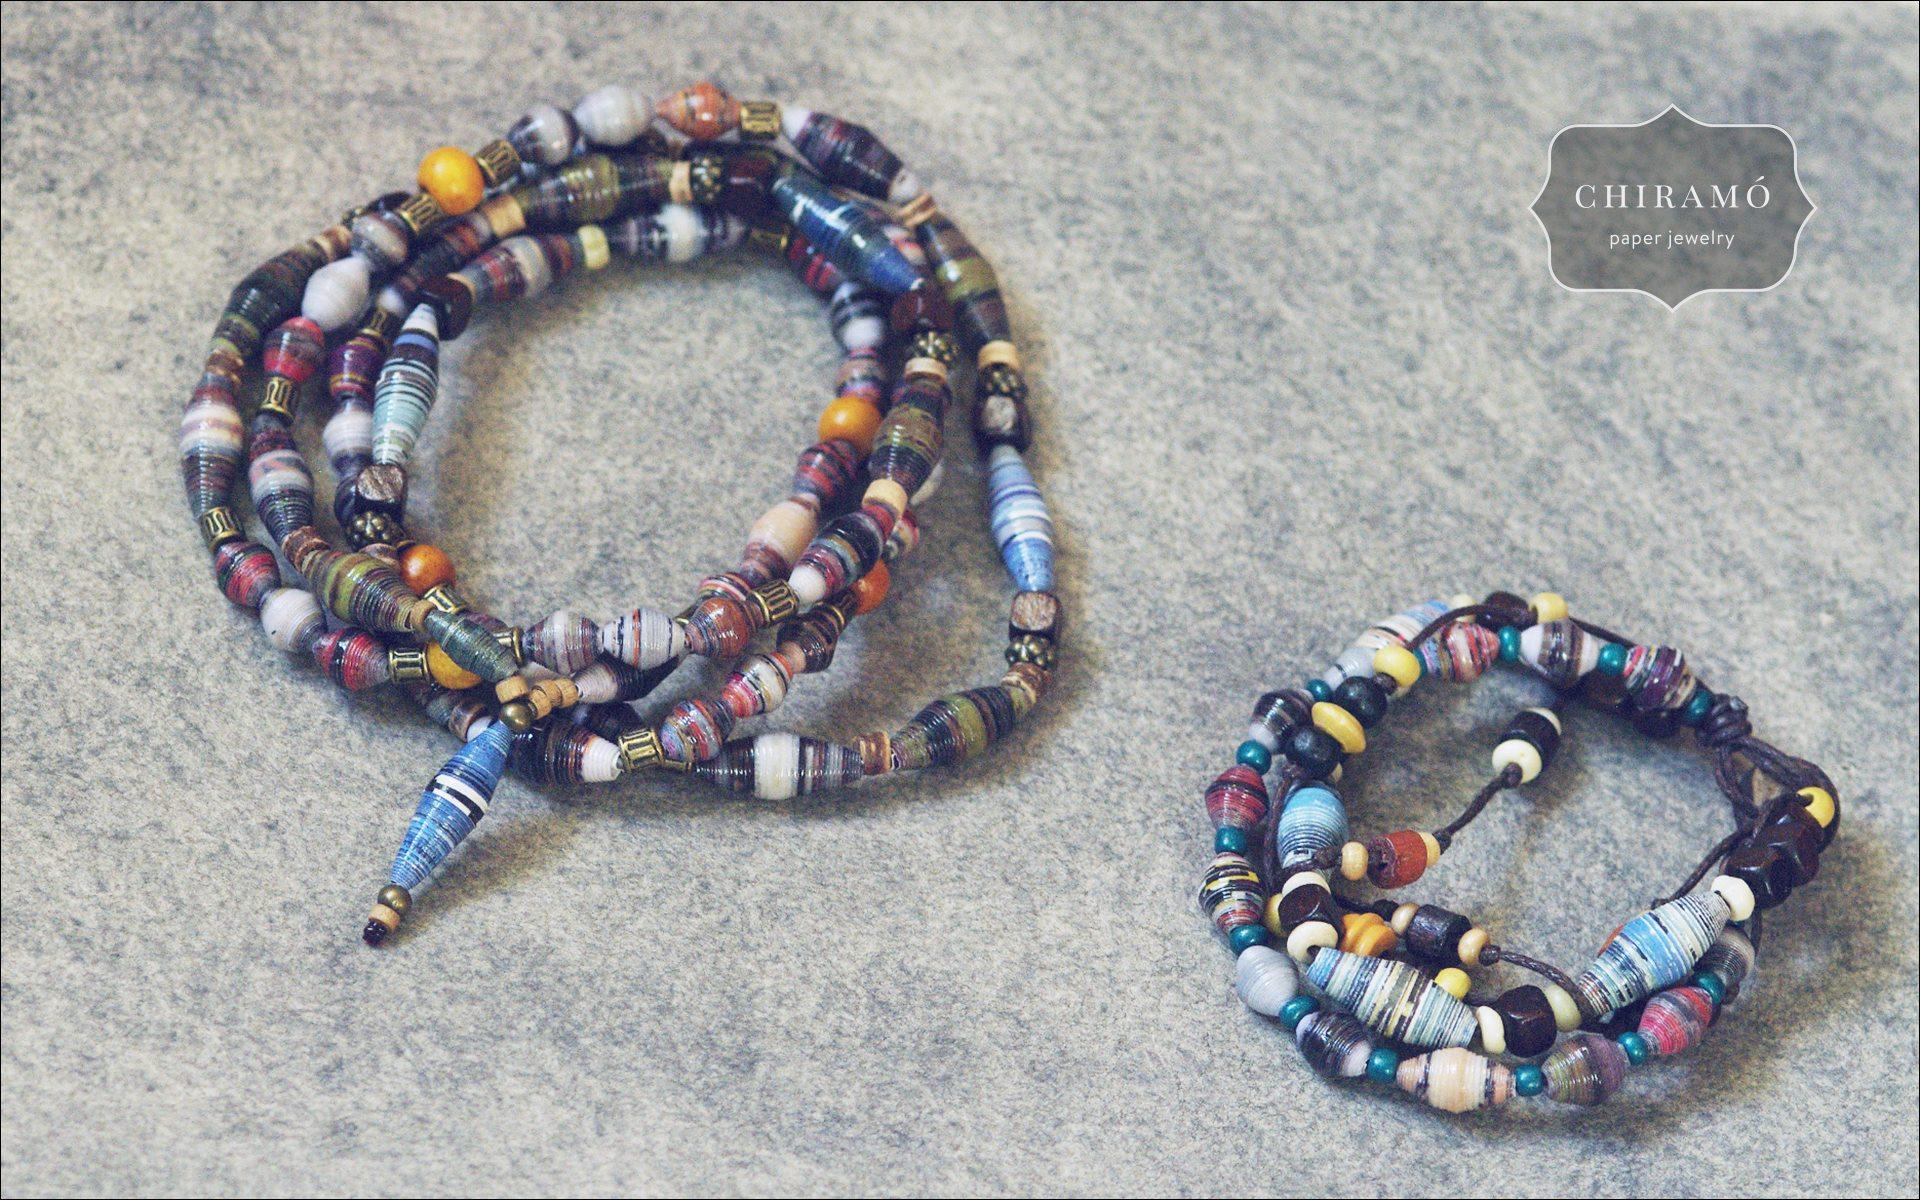 bijuterii din hartie reciclata chiramo (1)